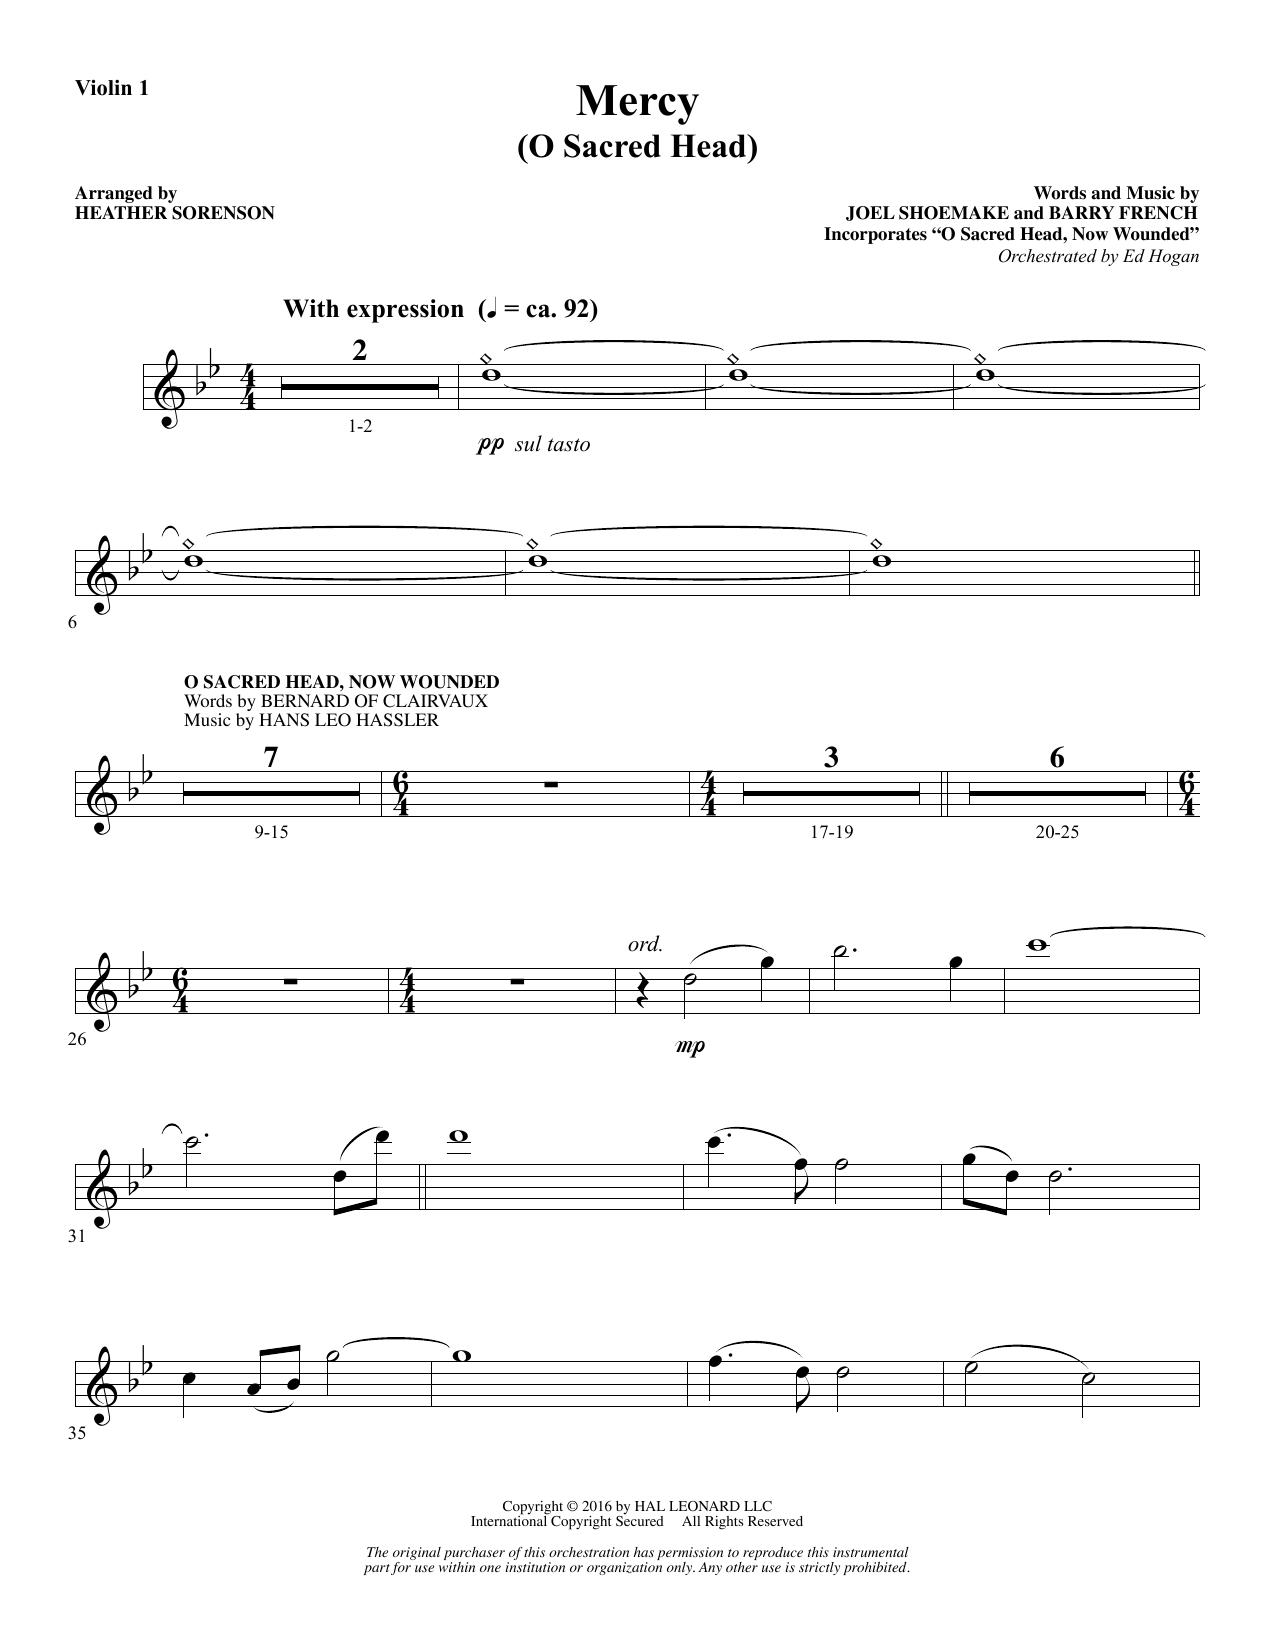 Mercy (O Sacred Head) - Violin 1 Sheet Music